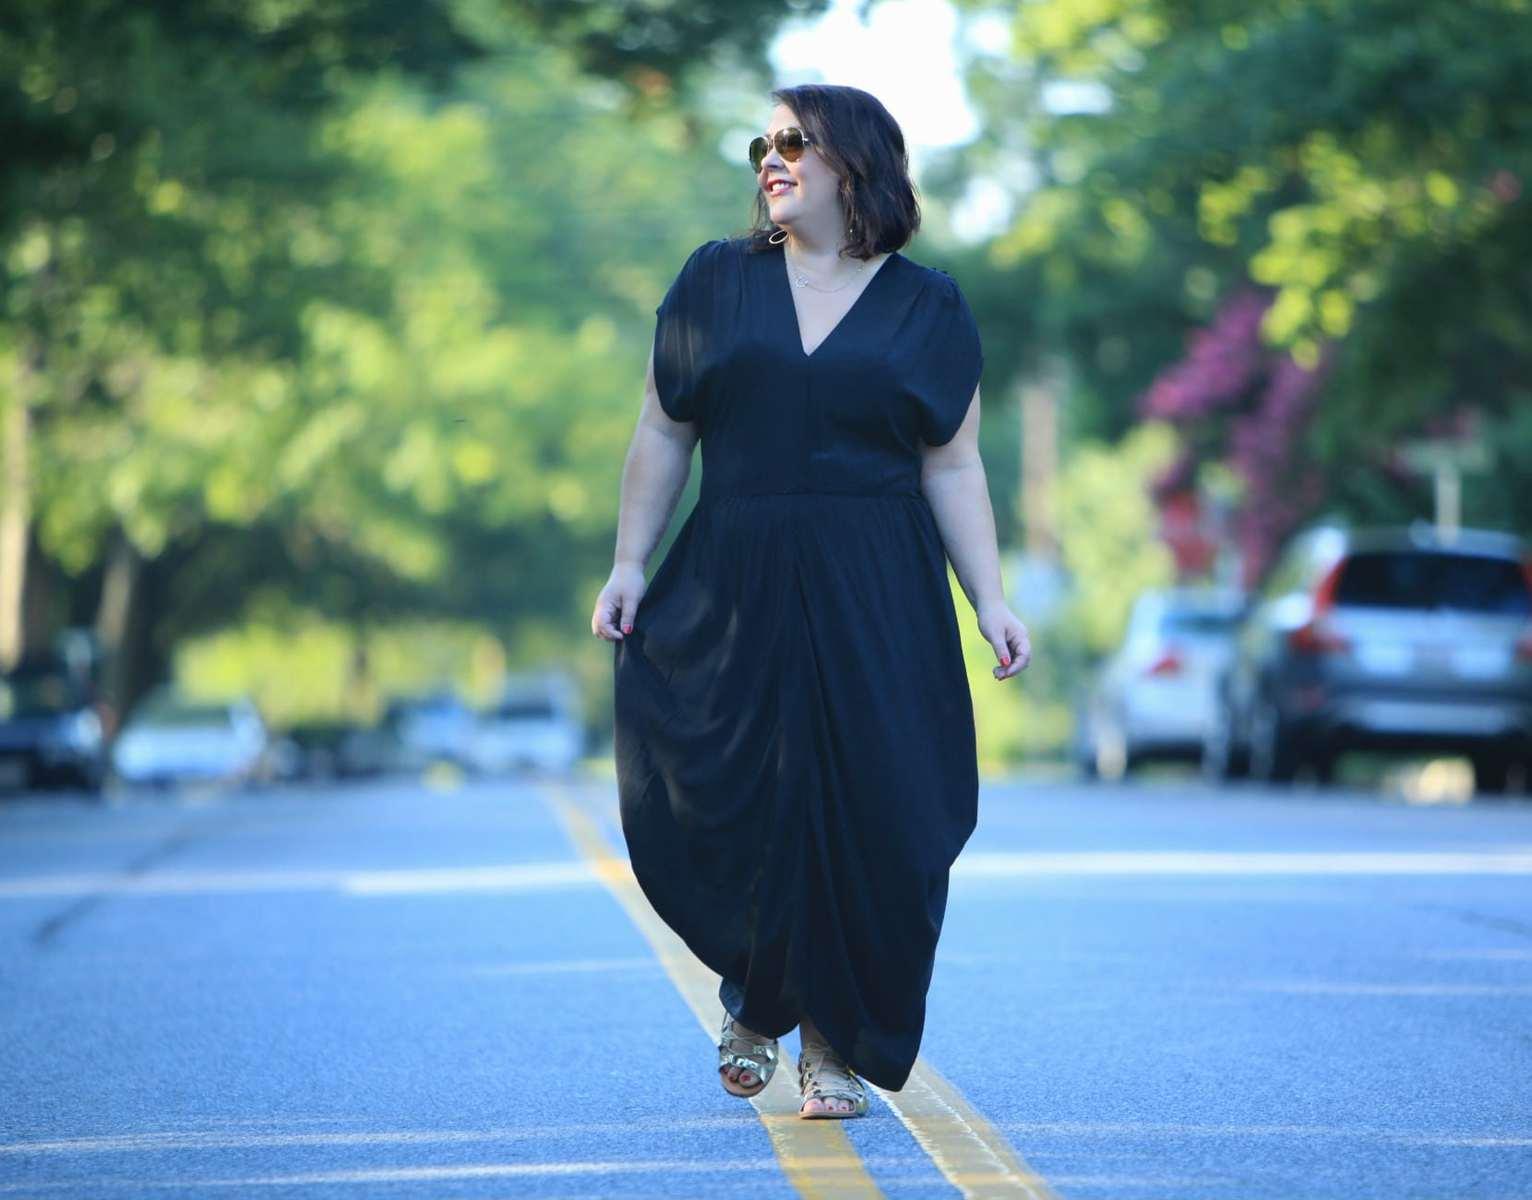 Wardrobe Oxygen in the Myne LA 'Heidi' dress in black silk with gold gladiator sandals and gold Ray-Ban aviators